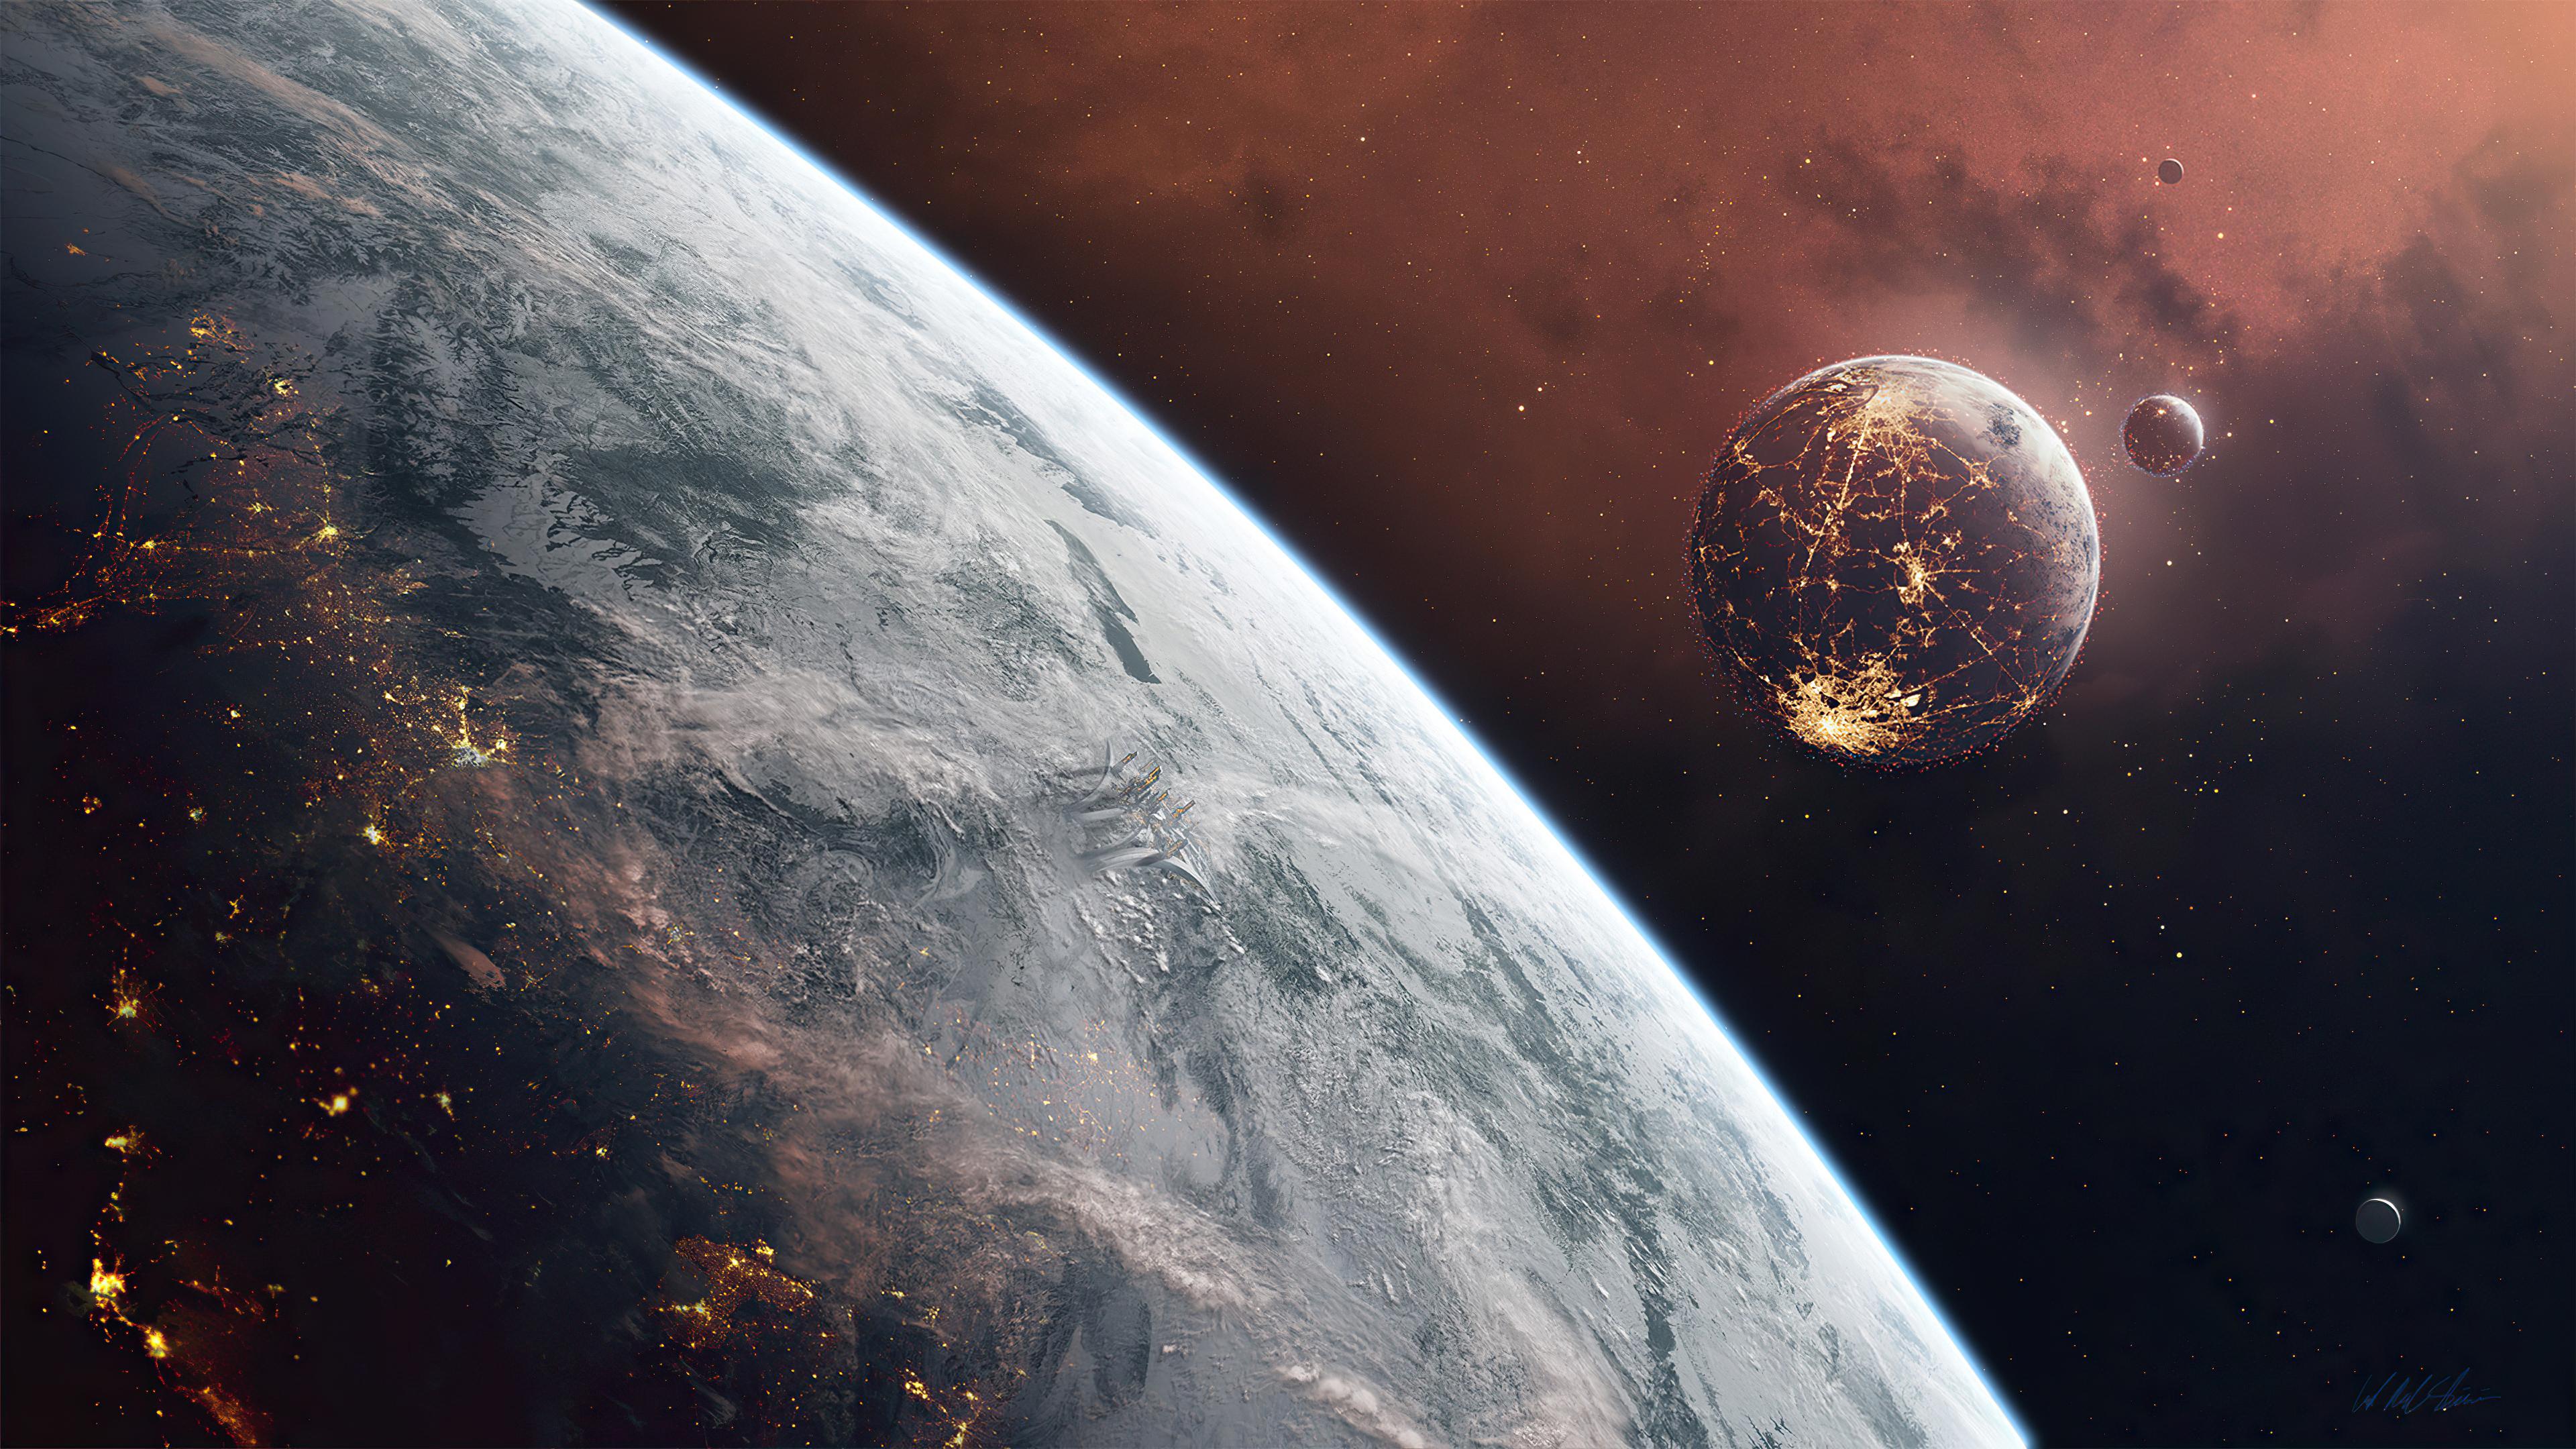 hades star space 4k 1629256768 - Hades Star Space 4k - Hades Star Space wallpapers, Hades Star Space 4k wallpapers